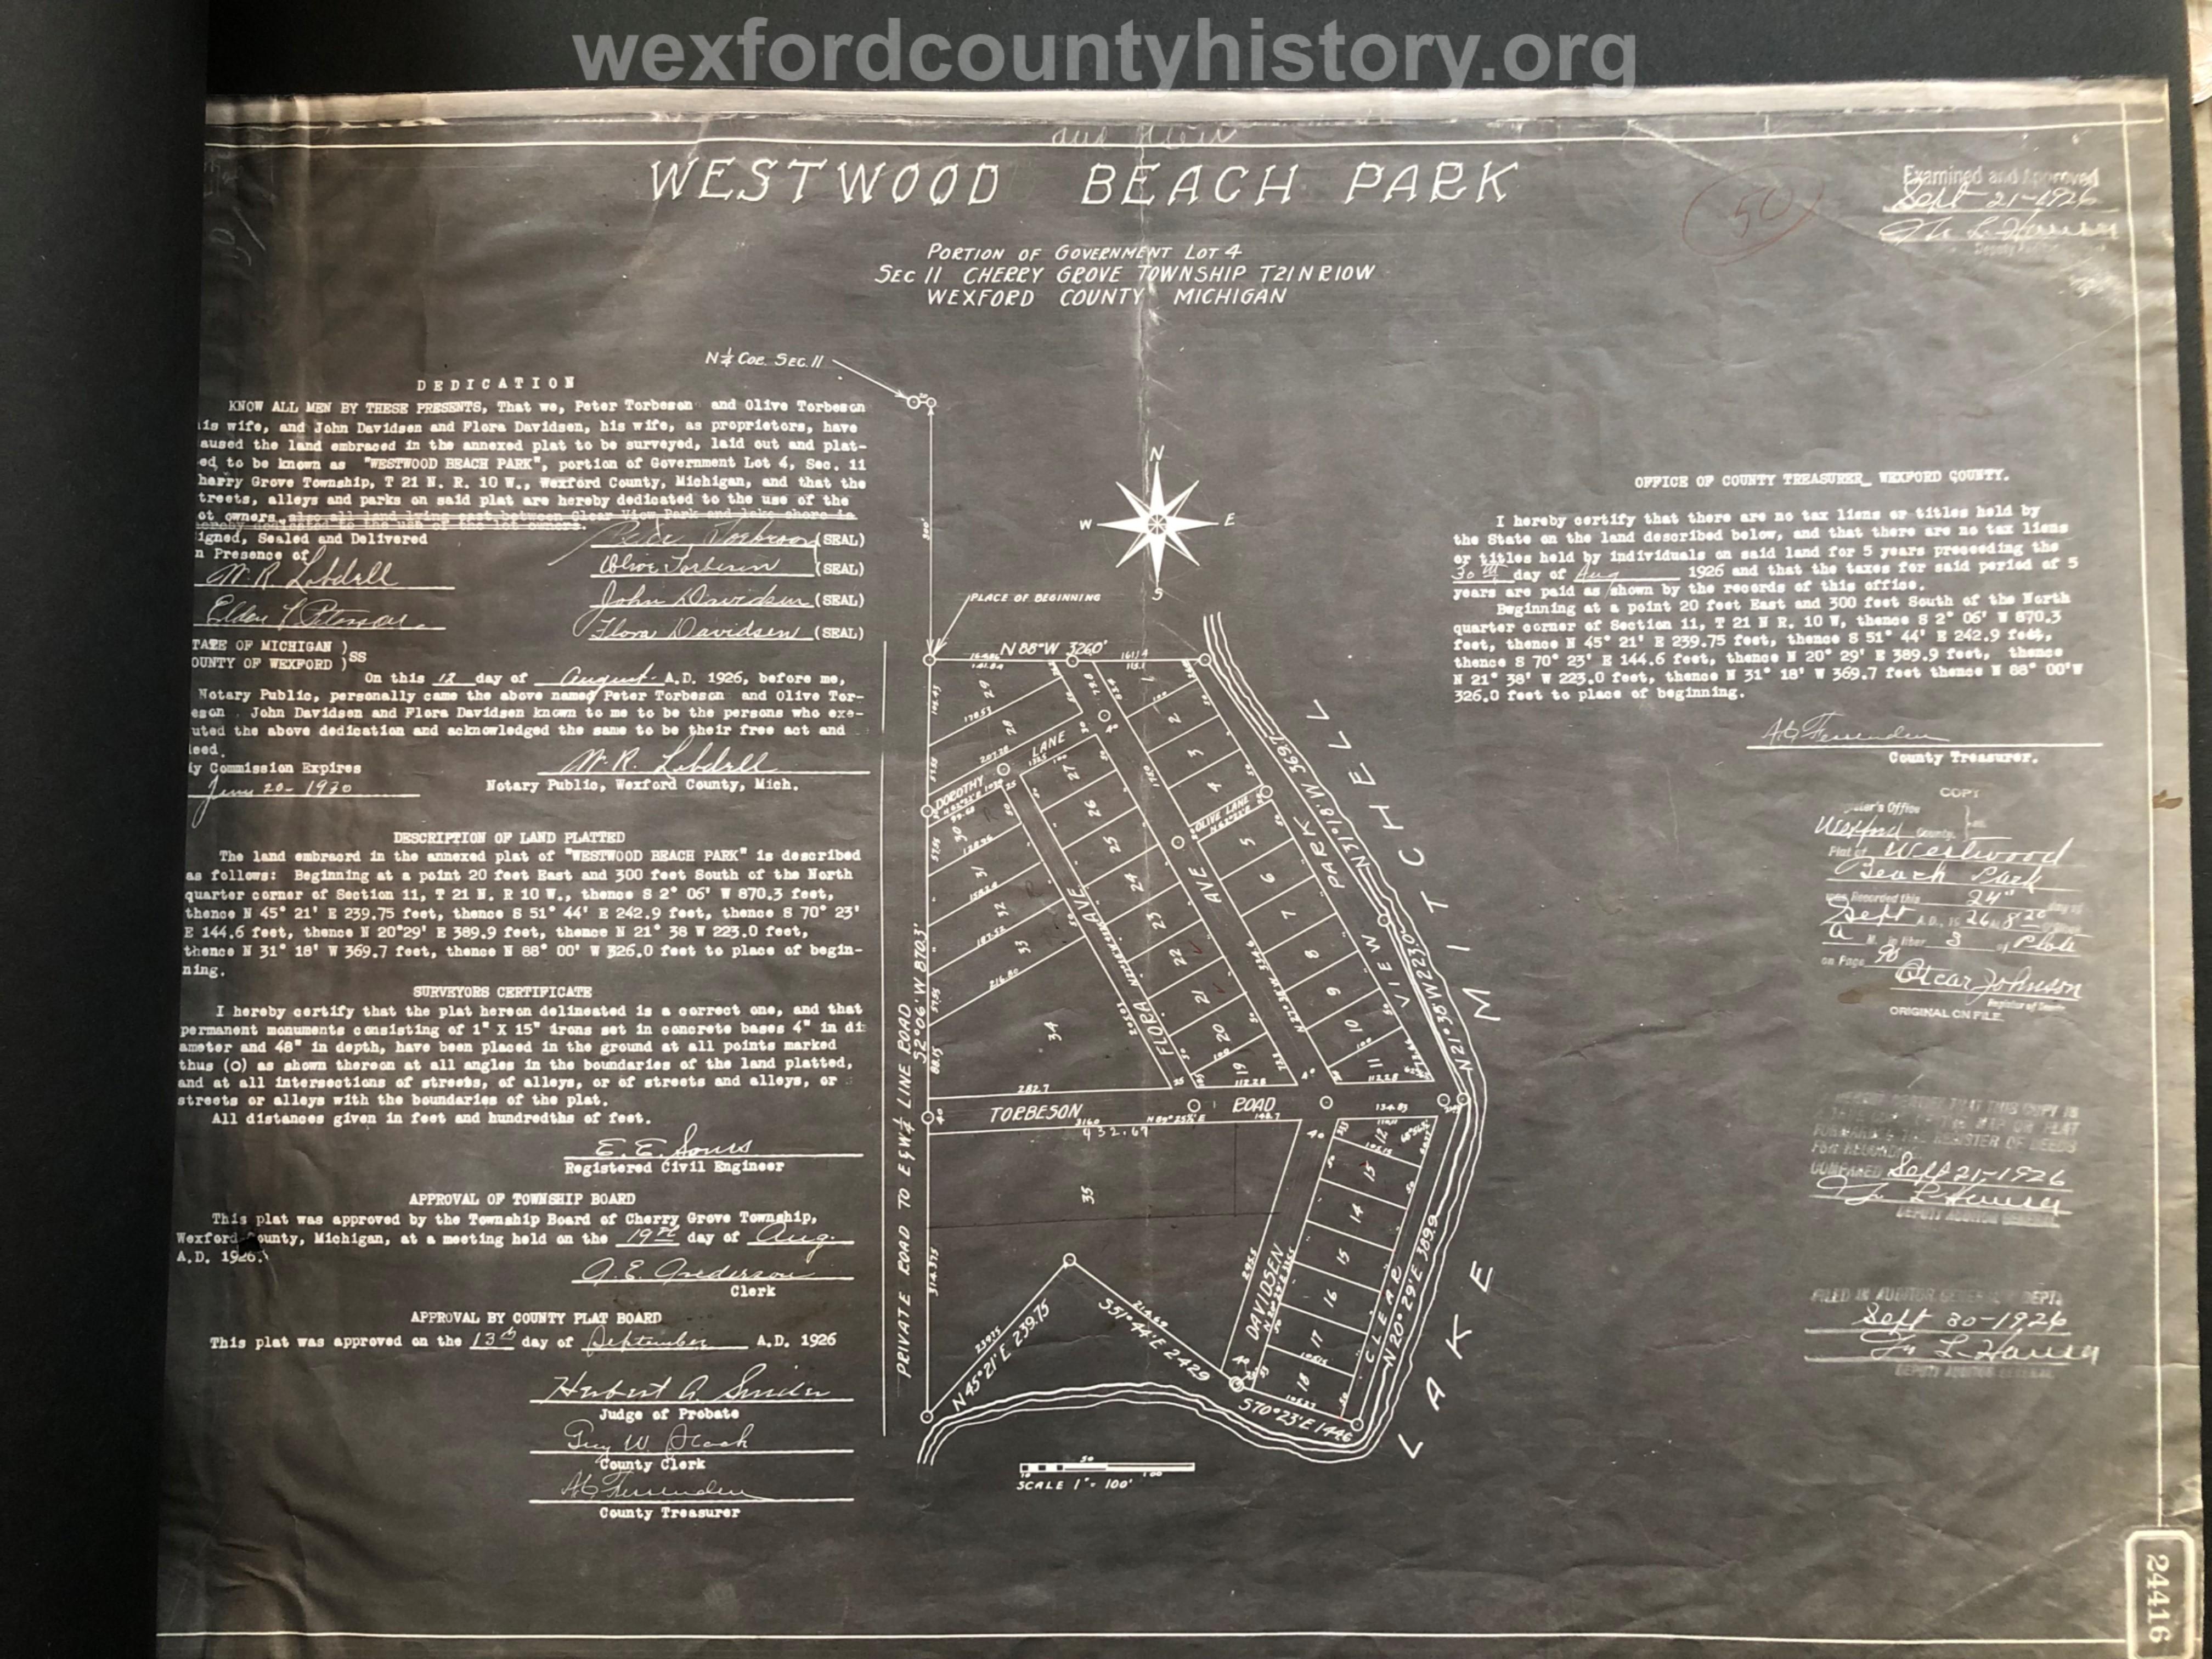 1926 - Westwood Beach Park